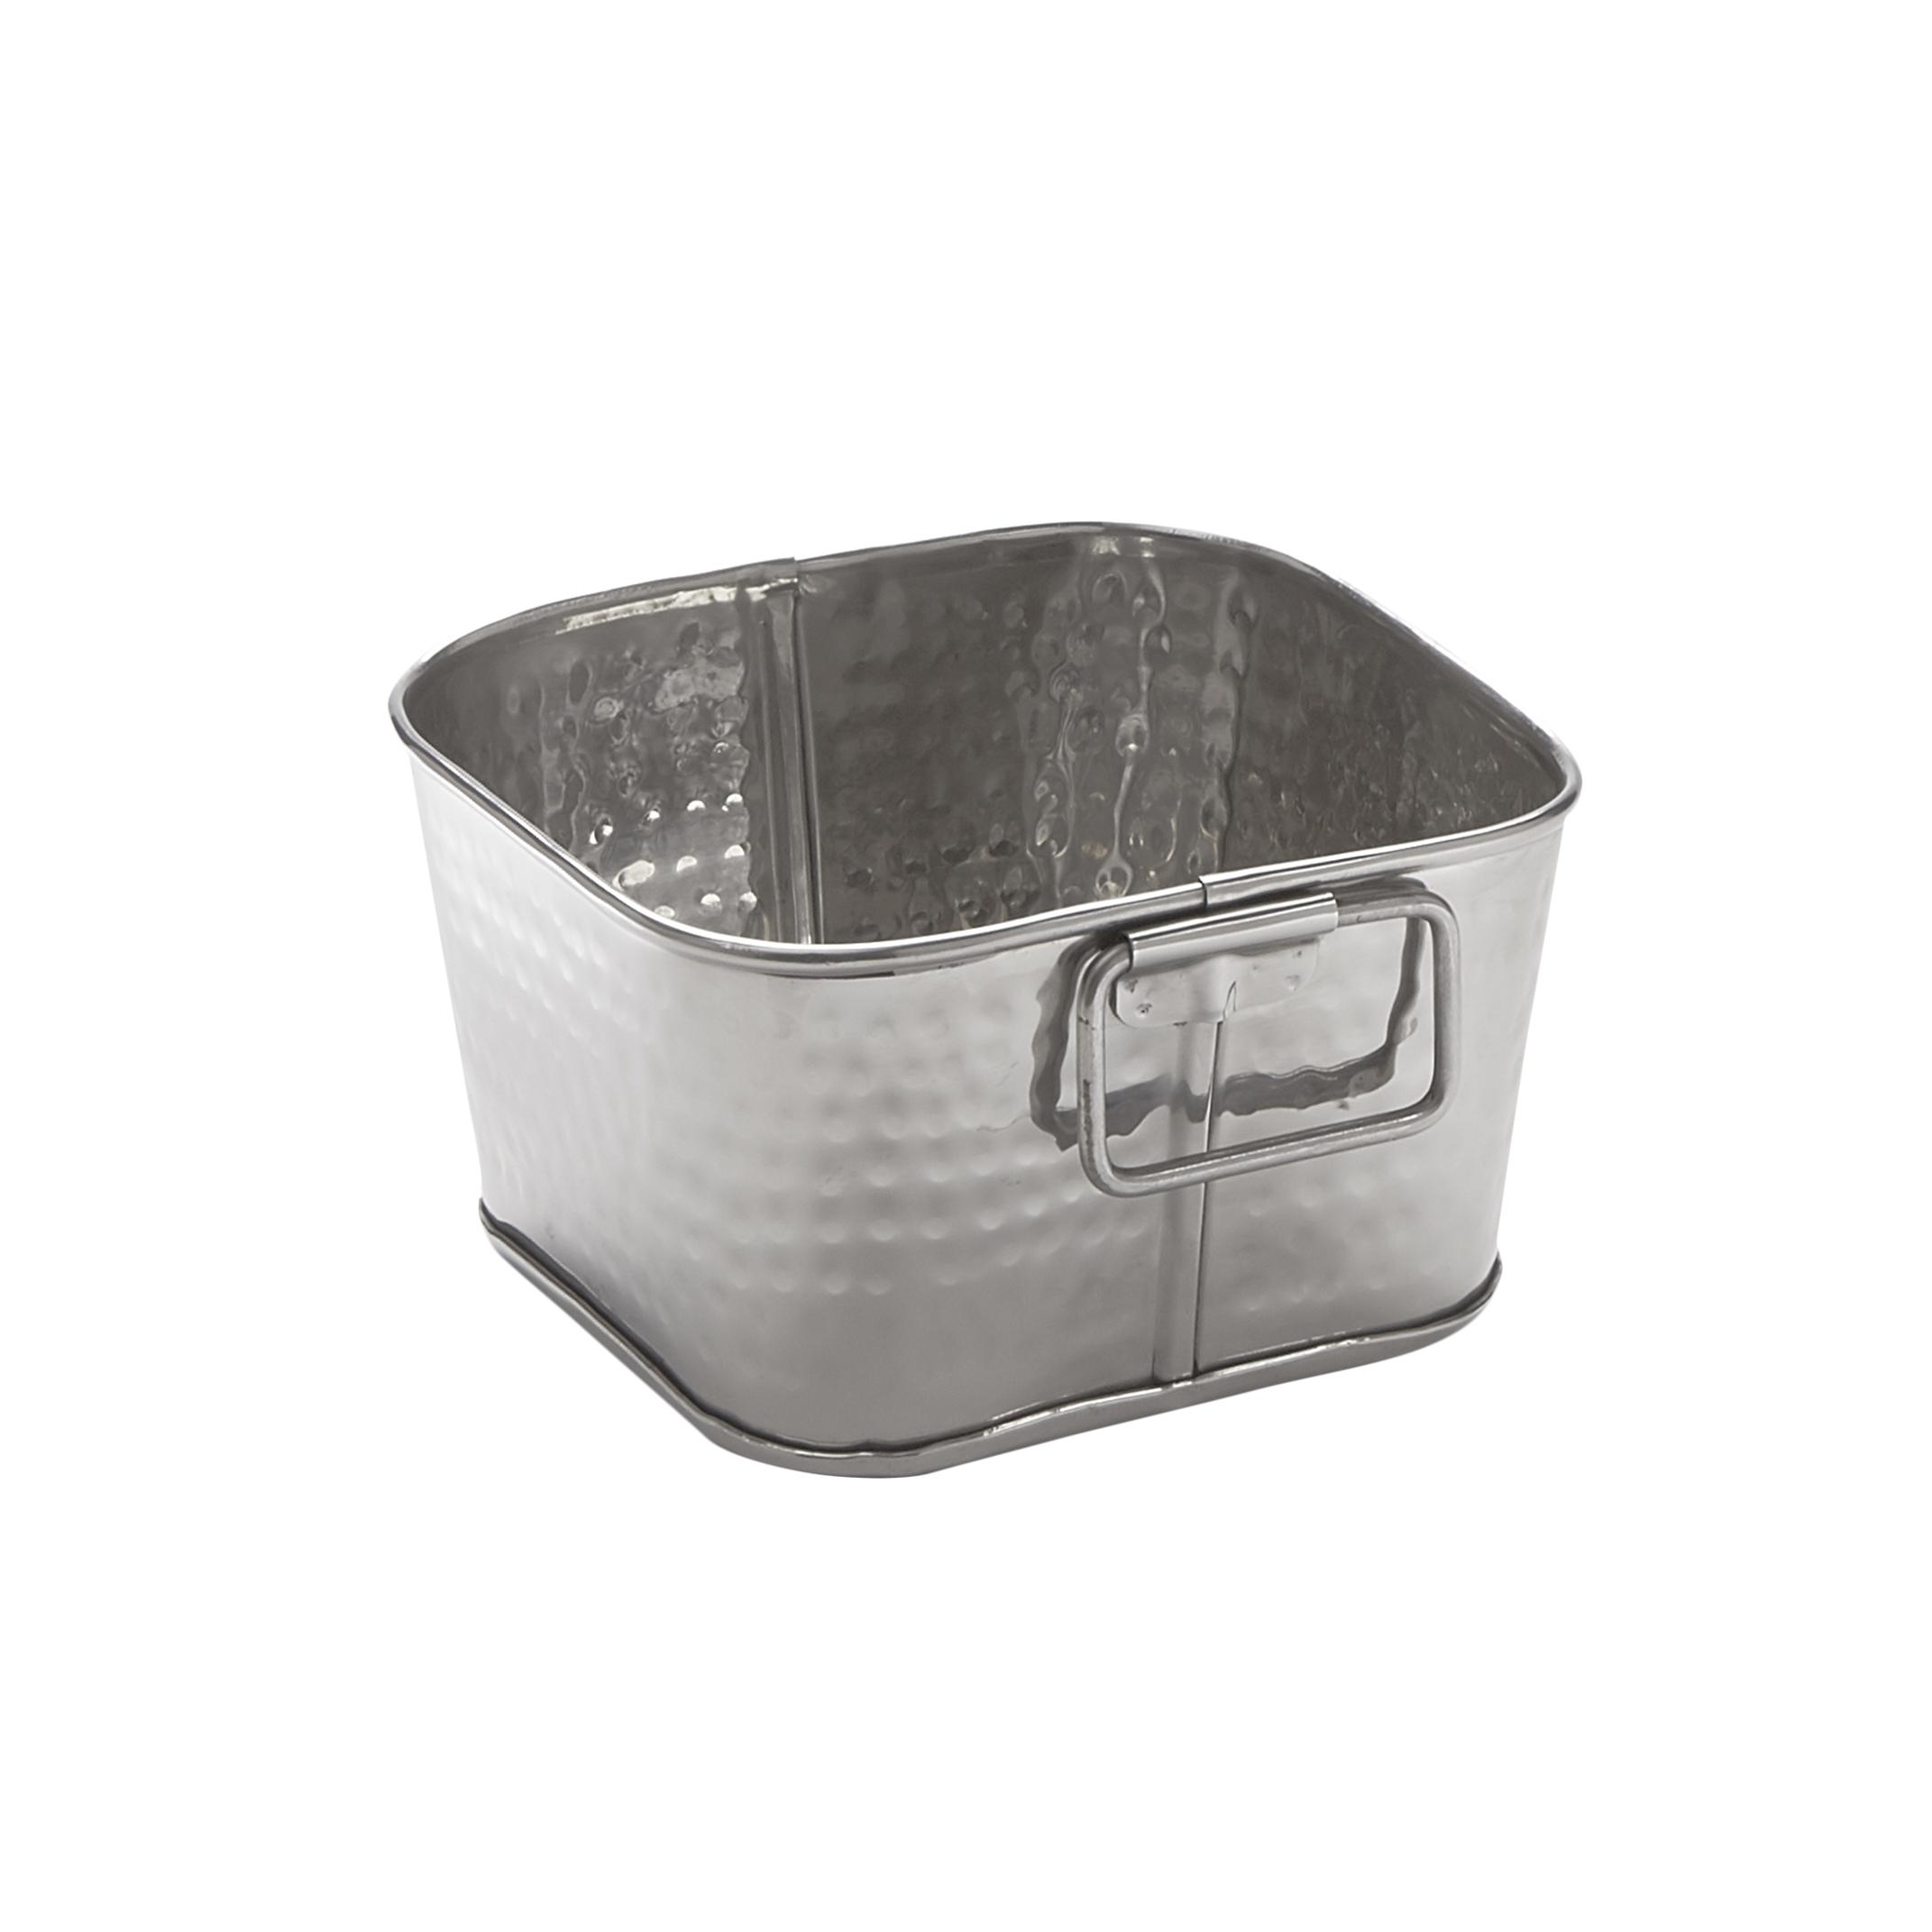 American Metalcraft STH6 beverage / ice tub